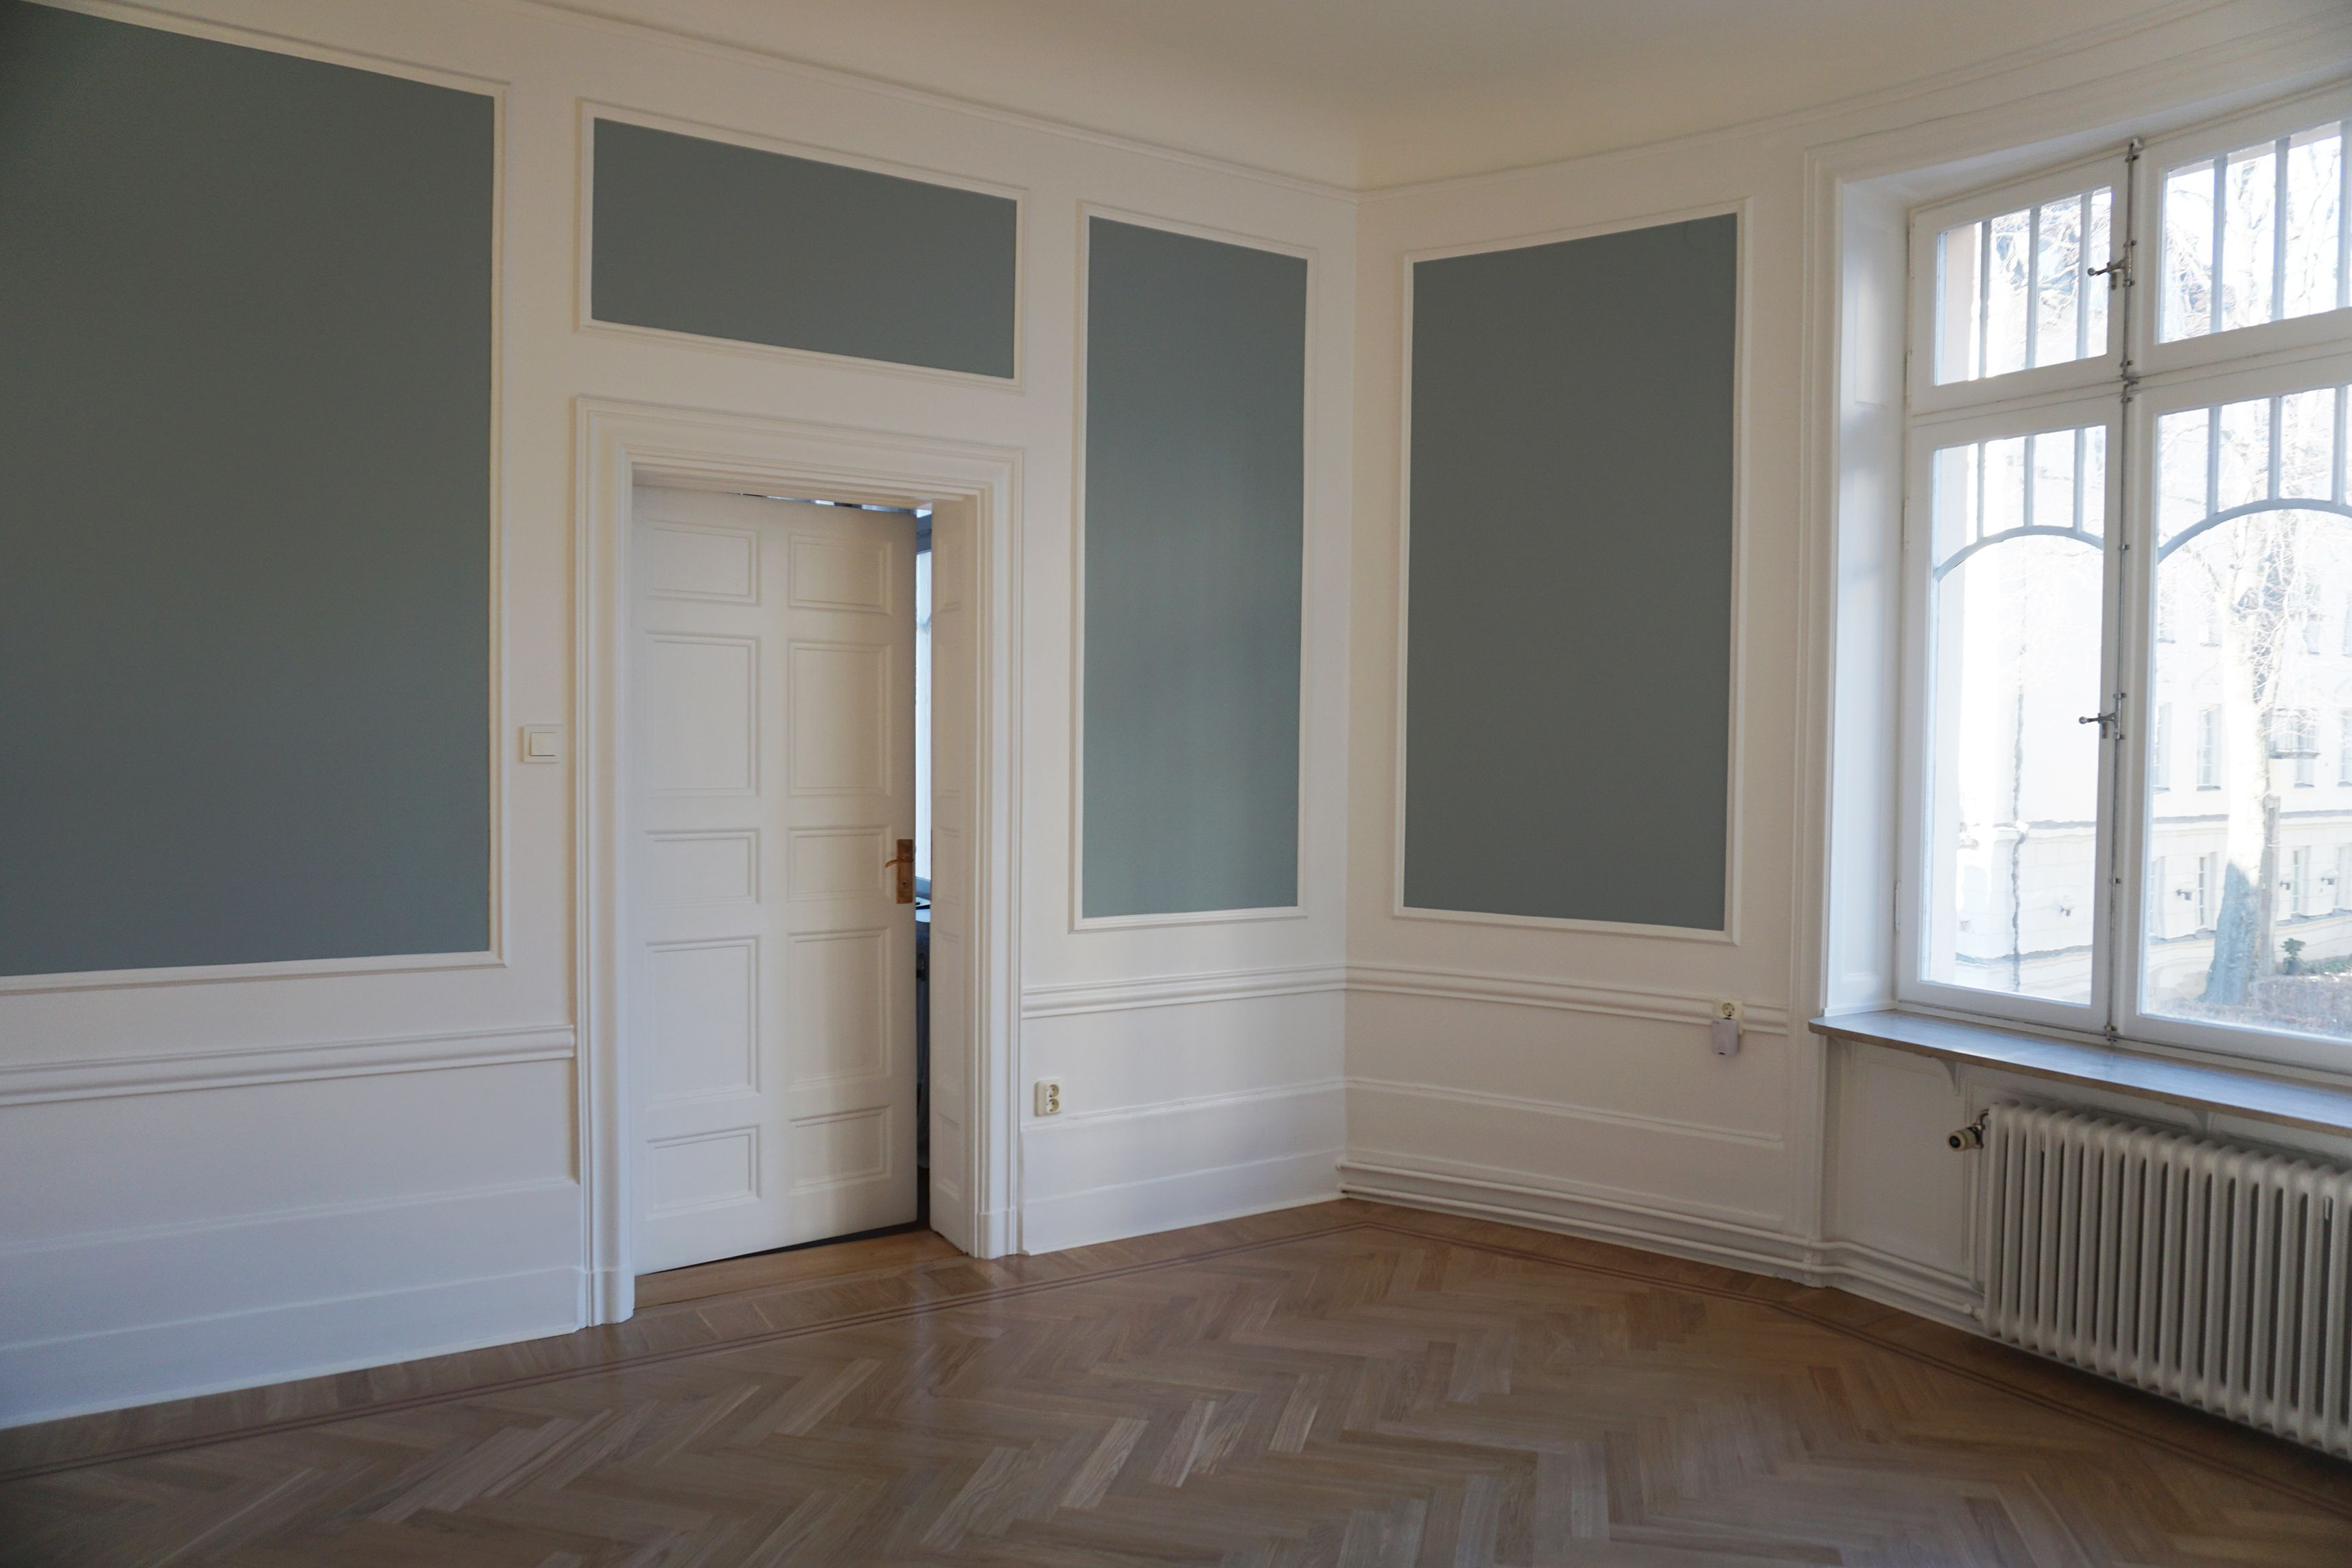 Q2 04 62 nordsj frg  Interior ColorsEmpty RoomBePaintingHome